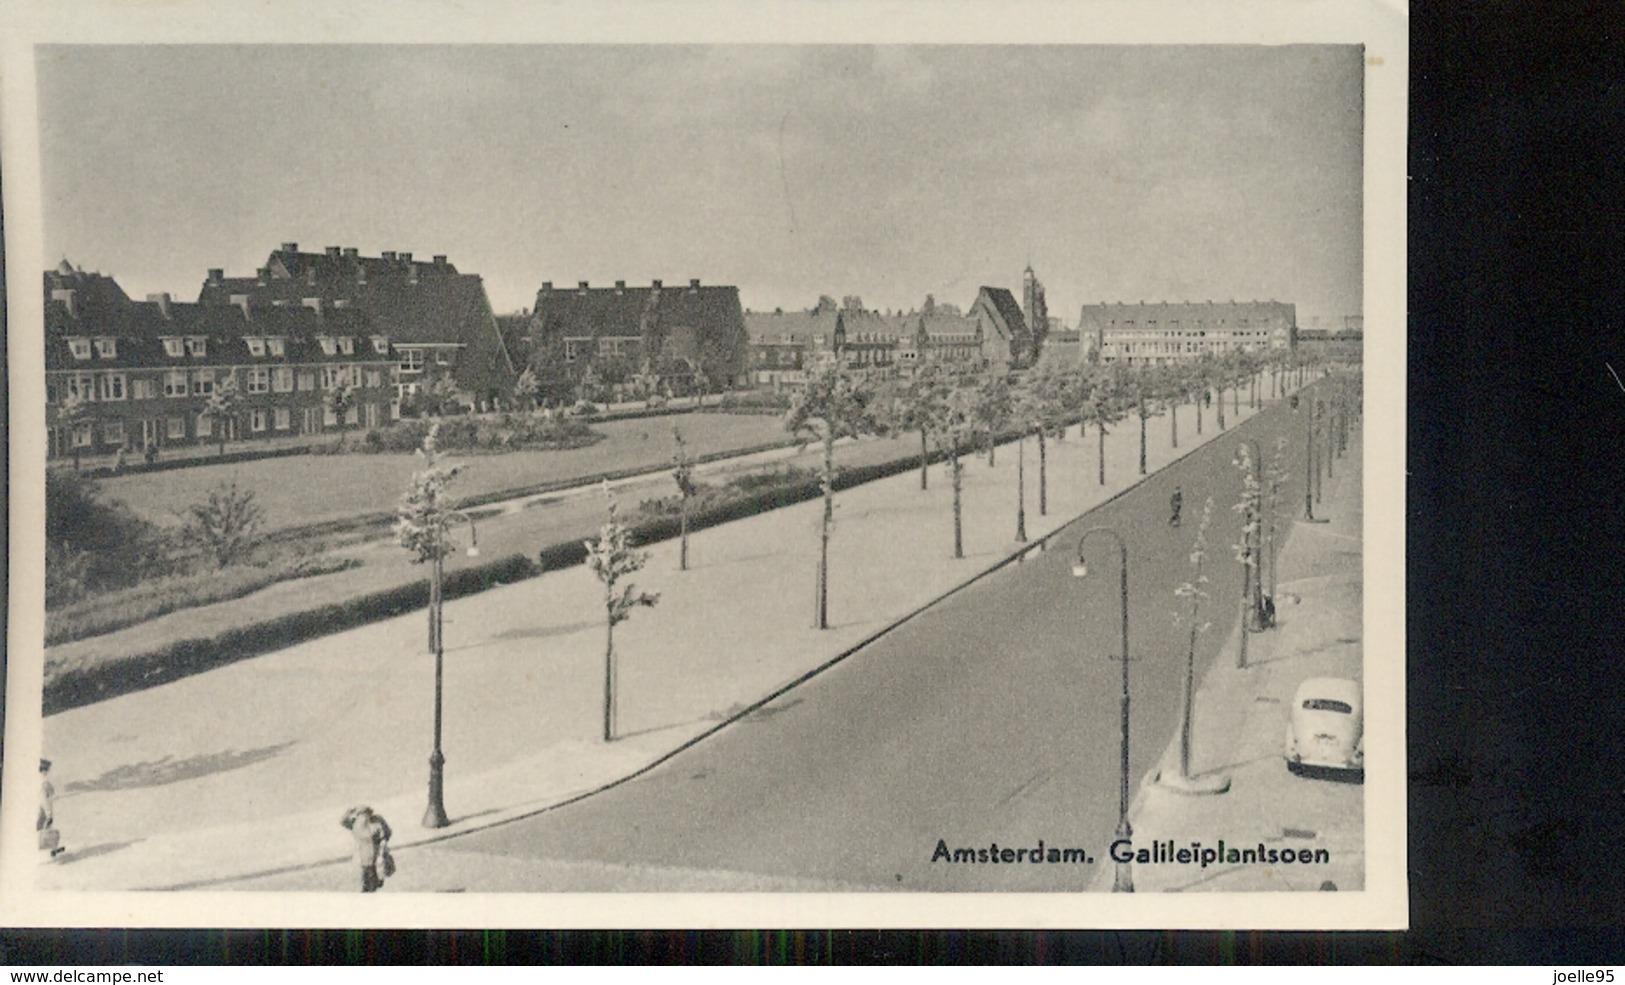 Amsterdam - Galileïplantsoen - 1947 - Amsterdam